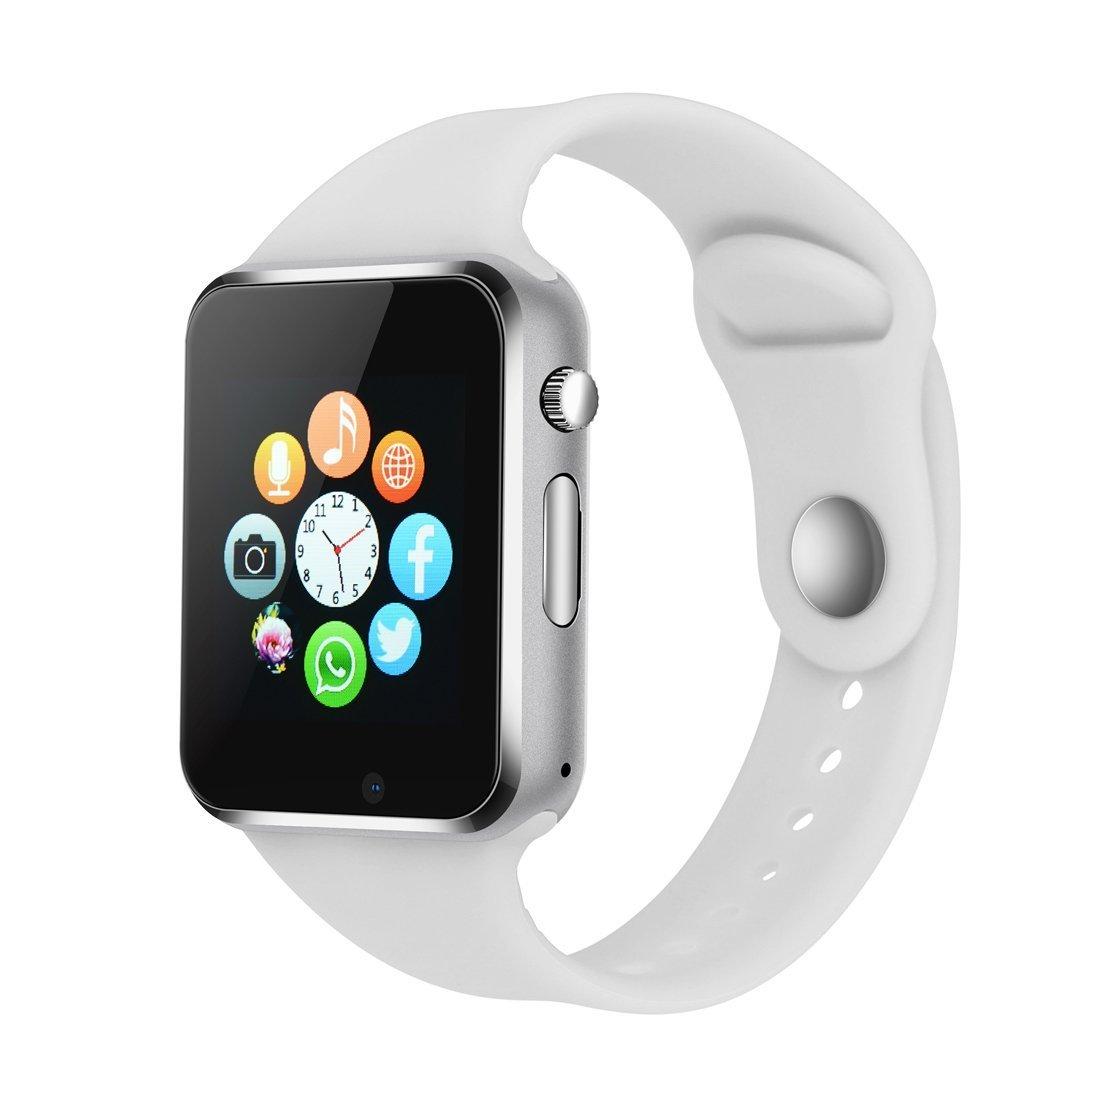 61laWJwq6oL. SL1107  - 10 Best Smartwatches 2019